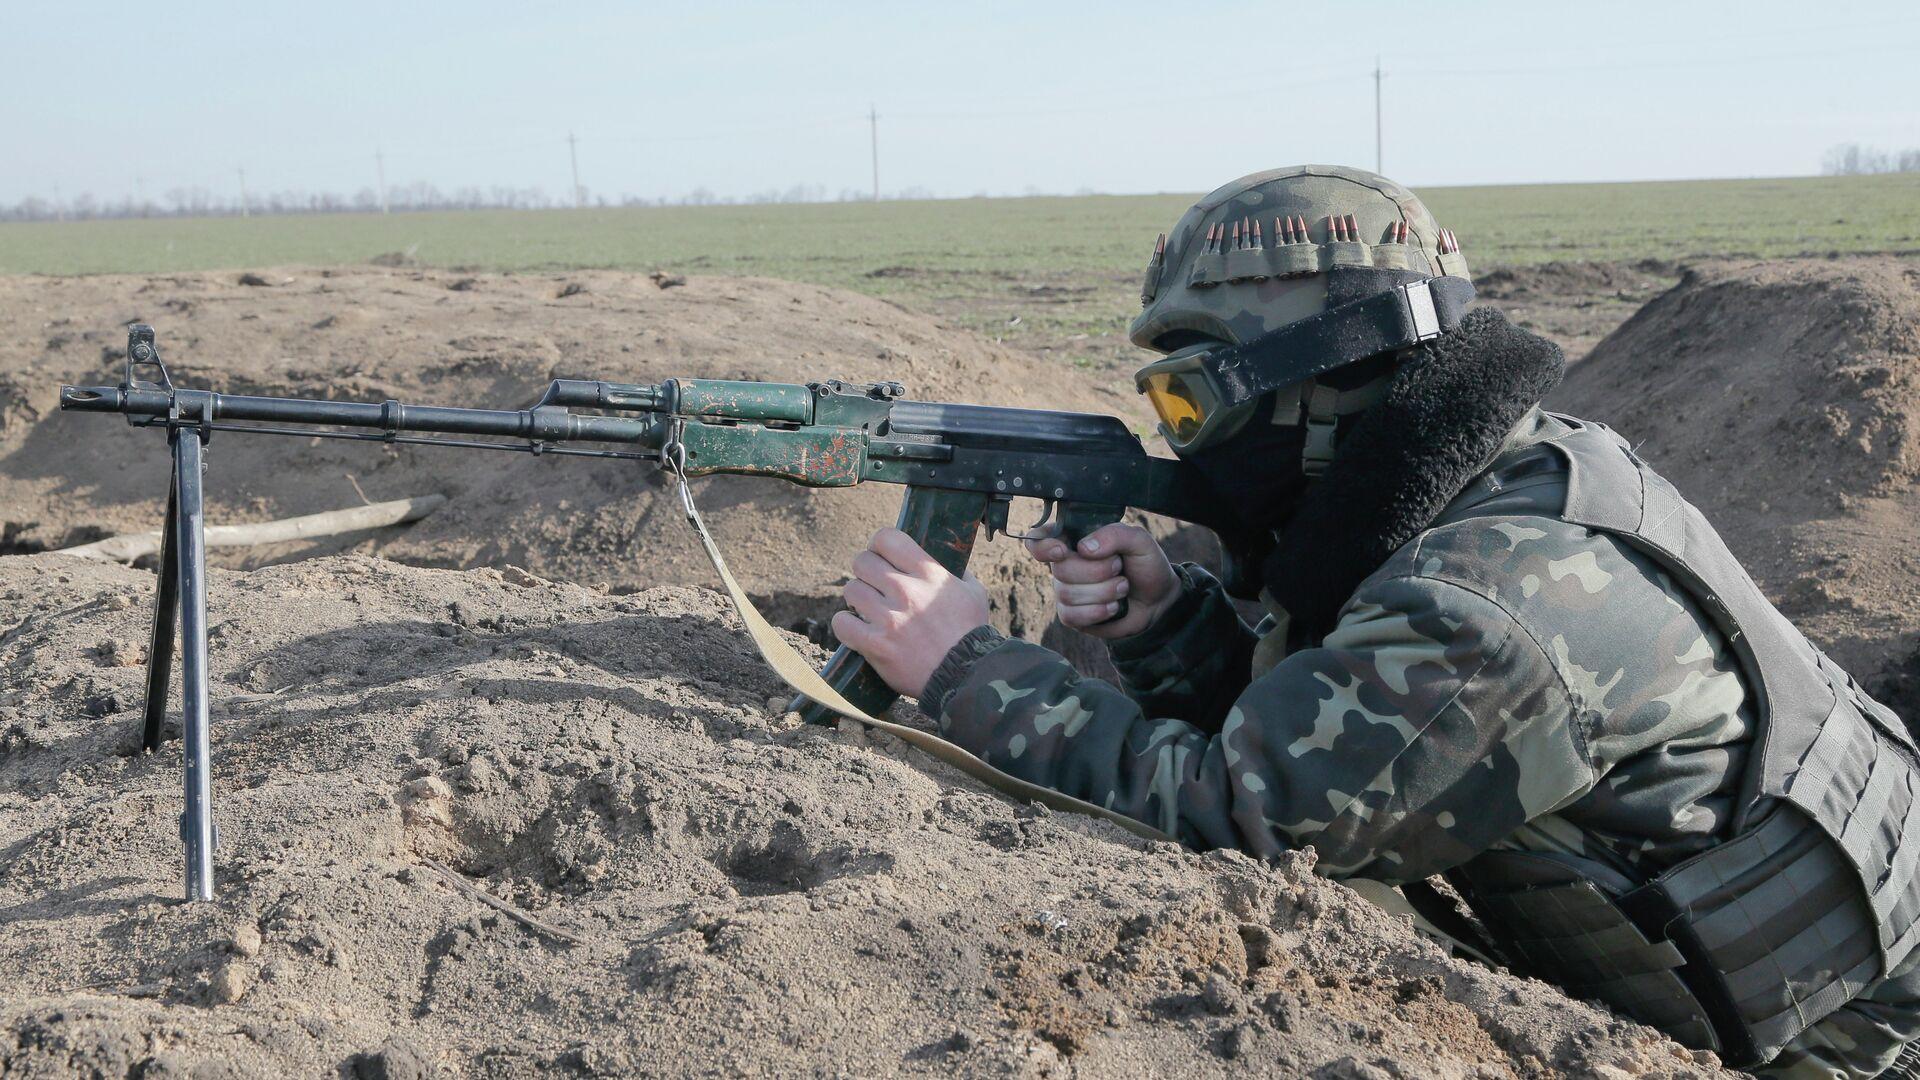 Un soldado ucraniano - Sputnik Mundo, 1920, 02.09.2021